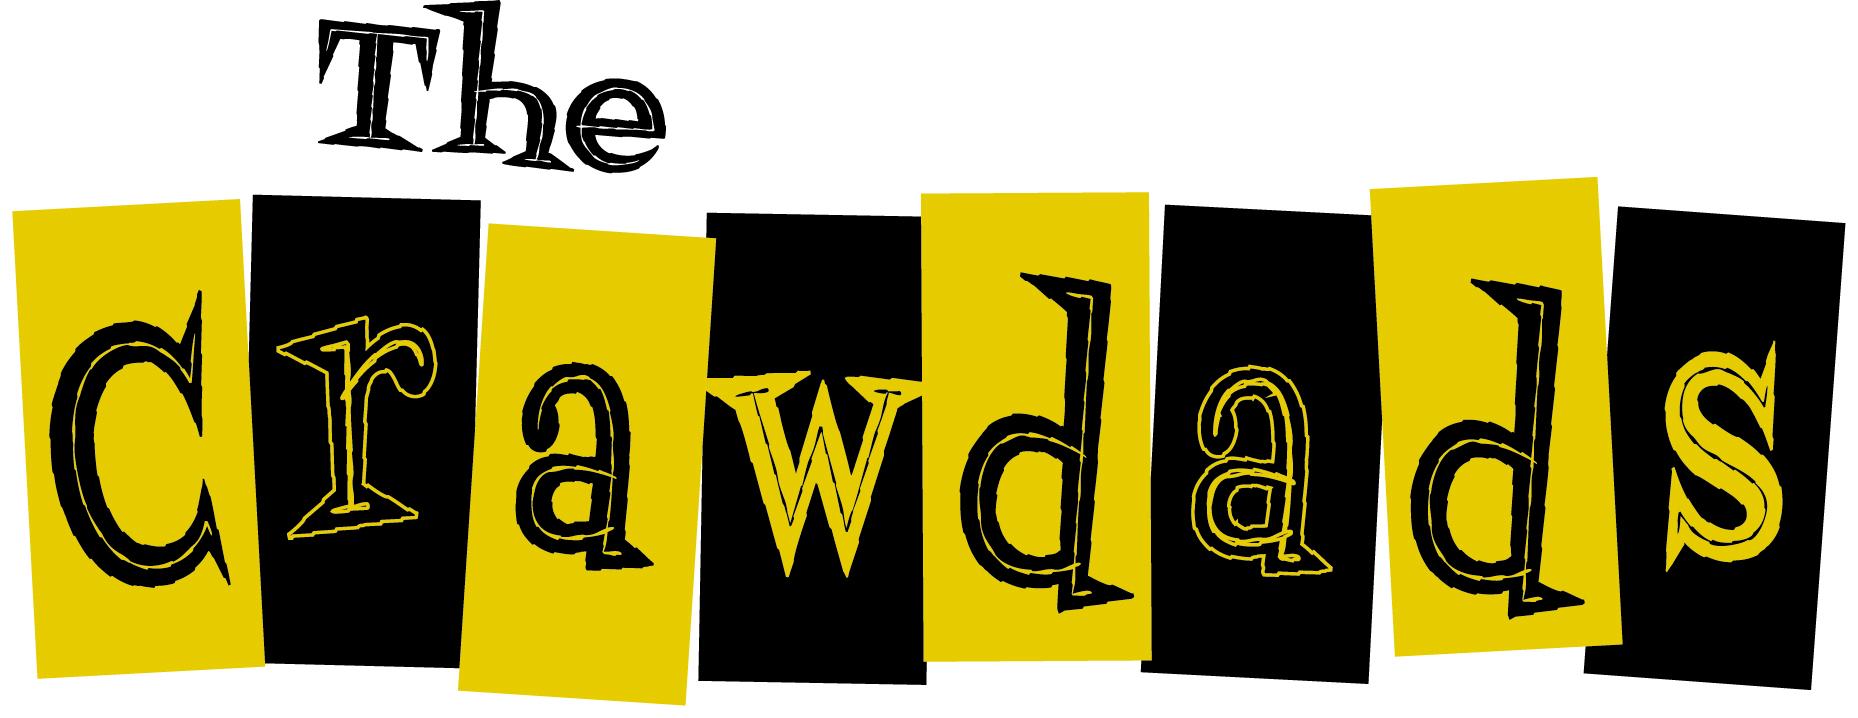 The Crawdads + Milhouse